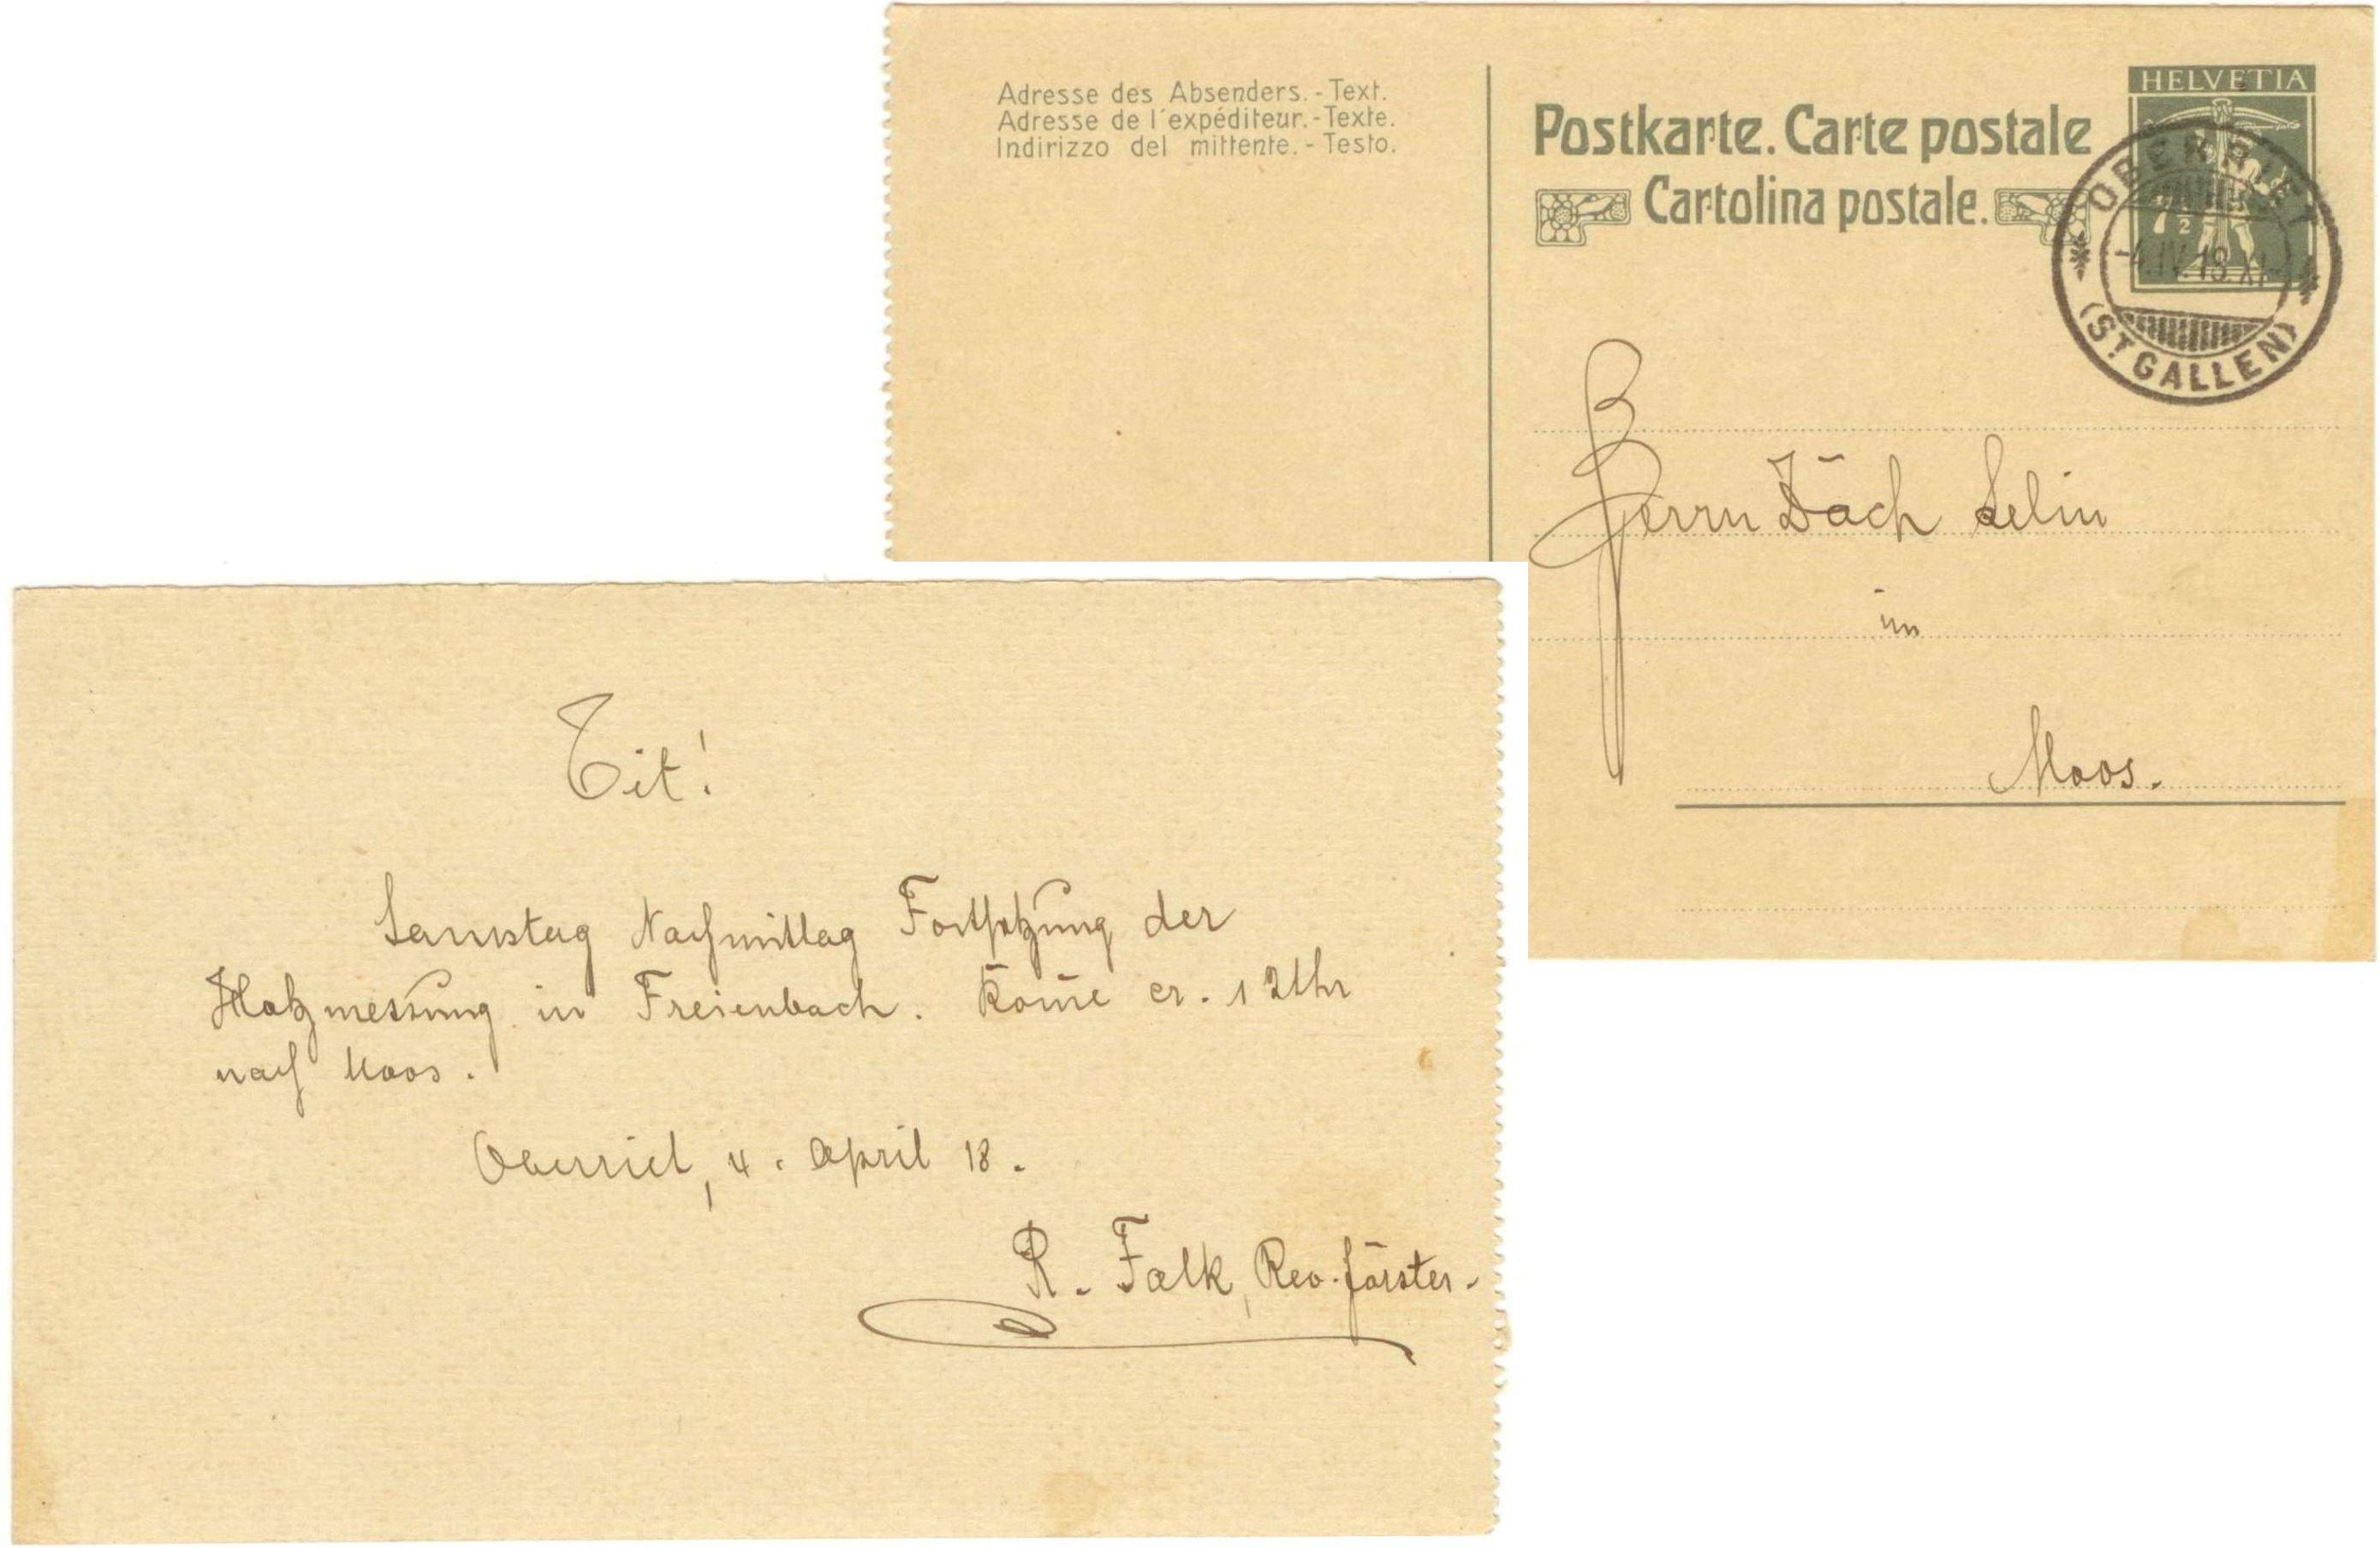 R. Falk, Revierförster, Oberriet (1918)